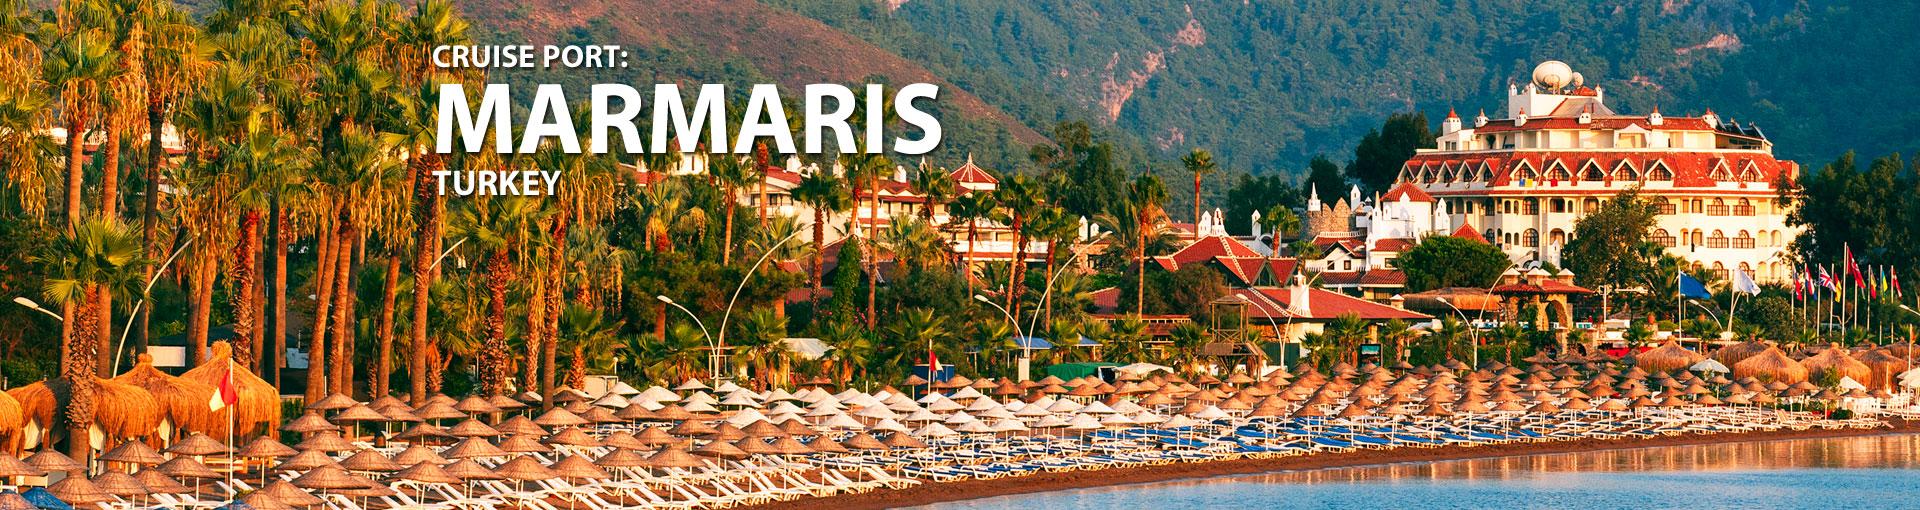 Cruises to Marmaris, Turkey